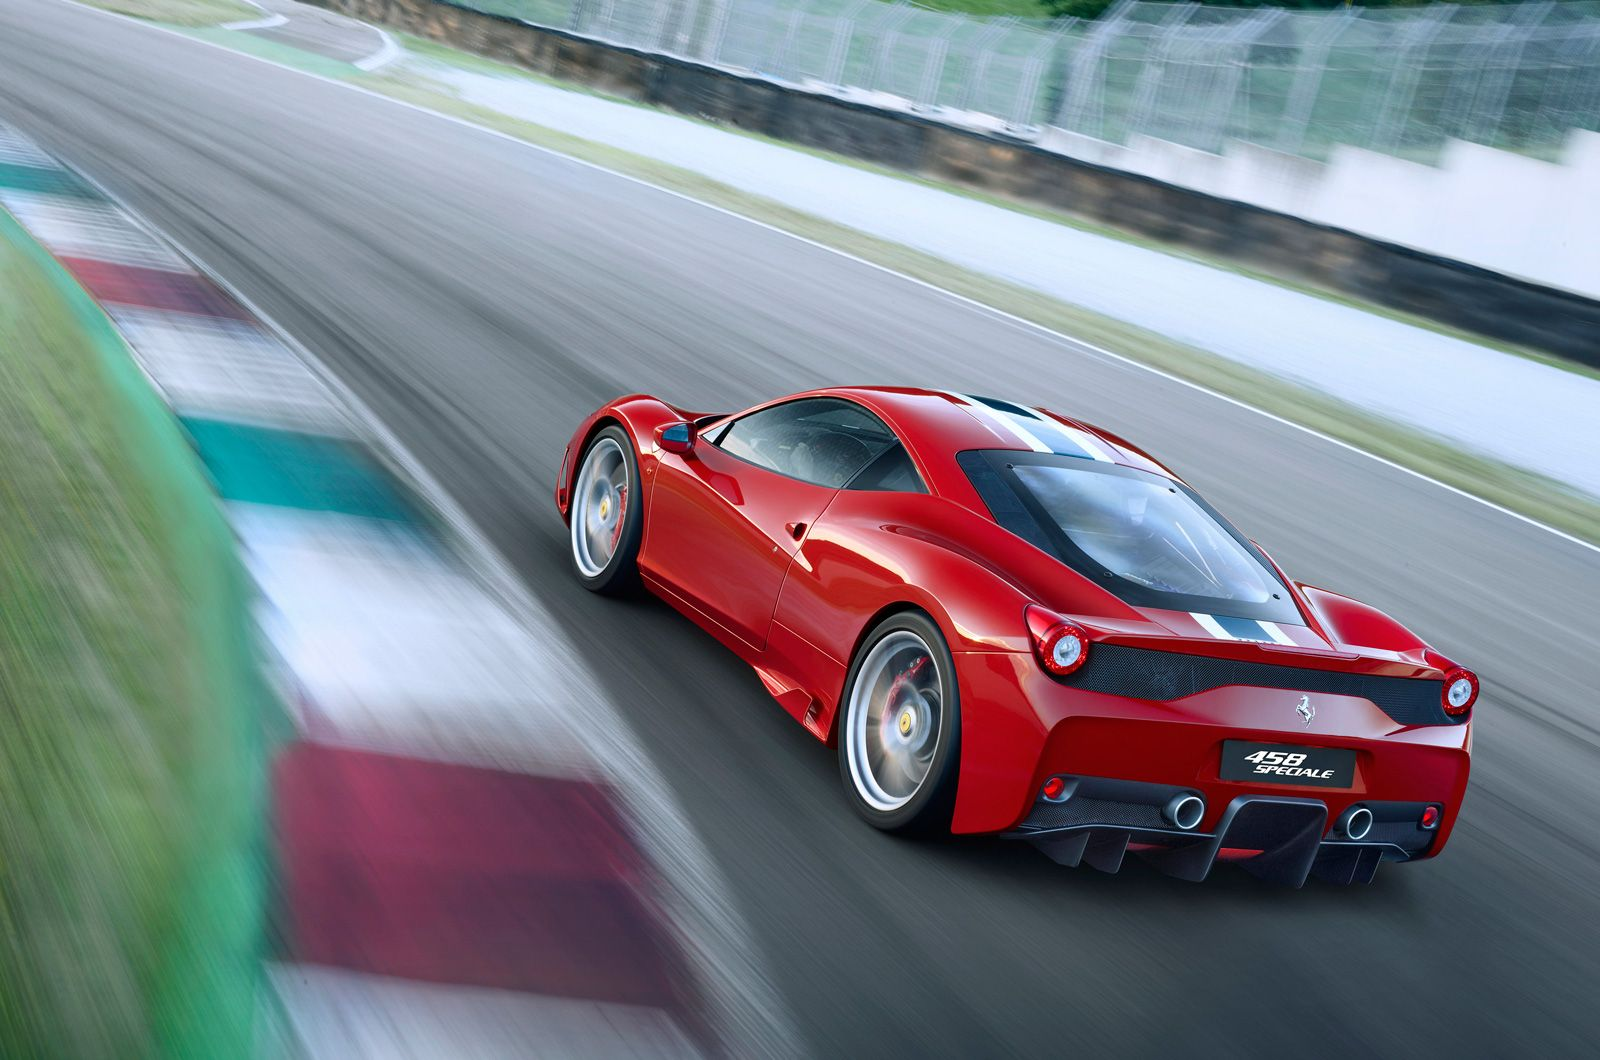 Ferrari 458 Italia Speciale Ferrari 458 Ferrari Voiture